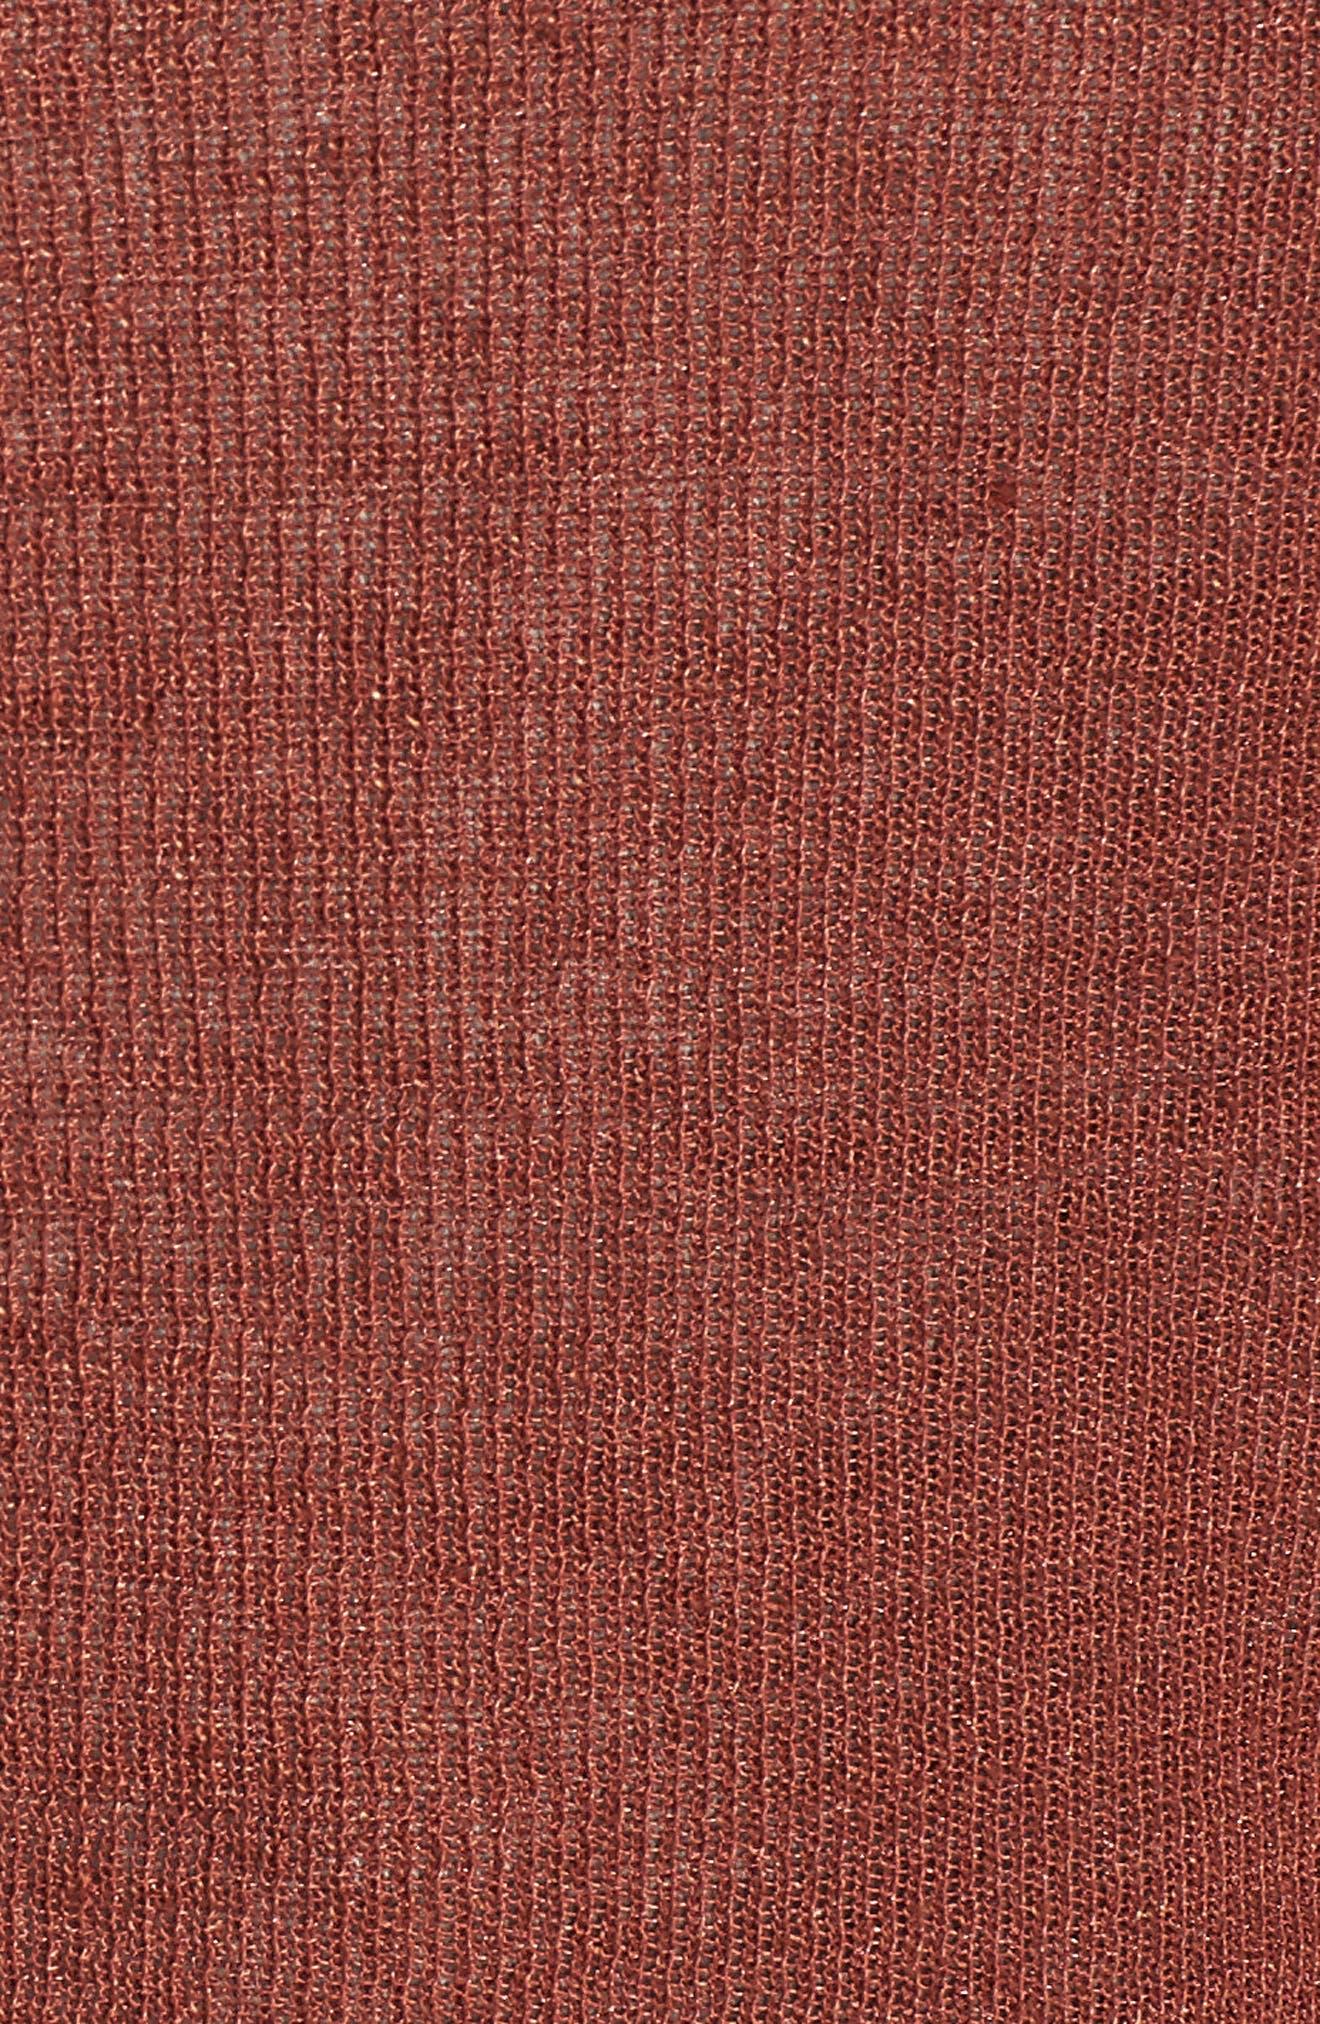 Tie Front Organic Linen Blend Cardigan,                             Alternate thumbnail 6, color,                             Russet